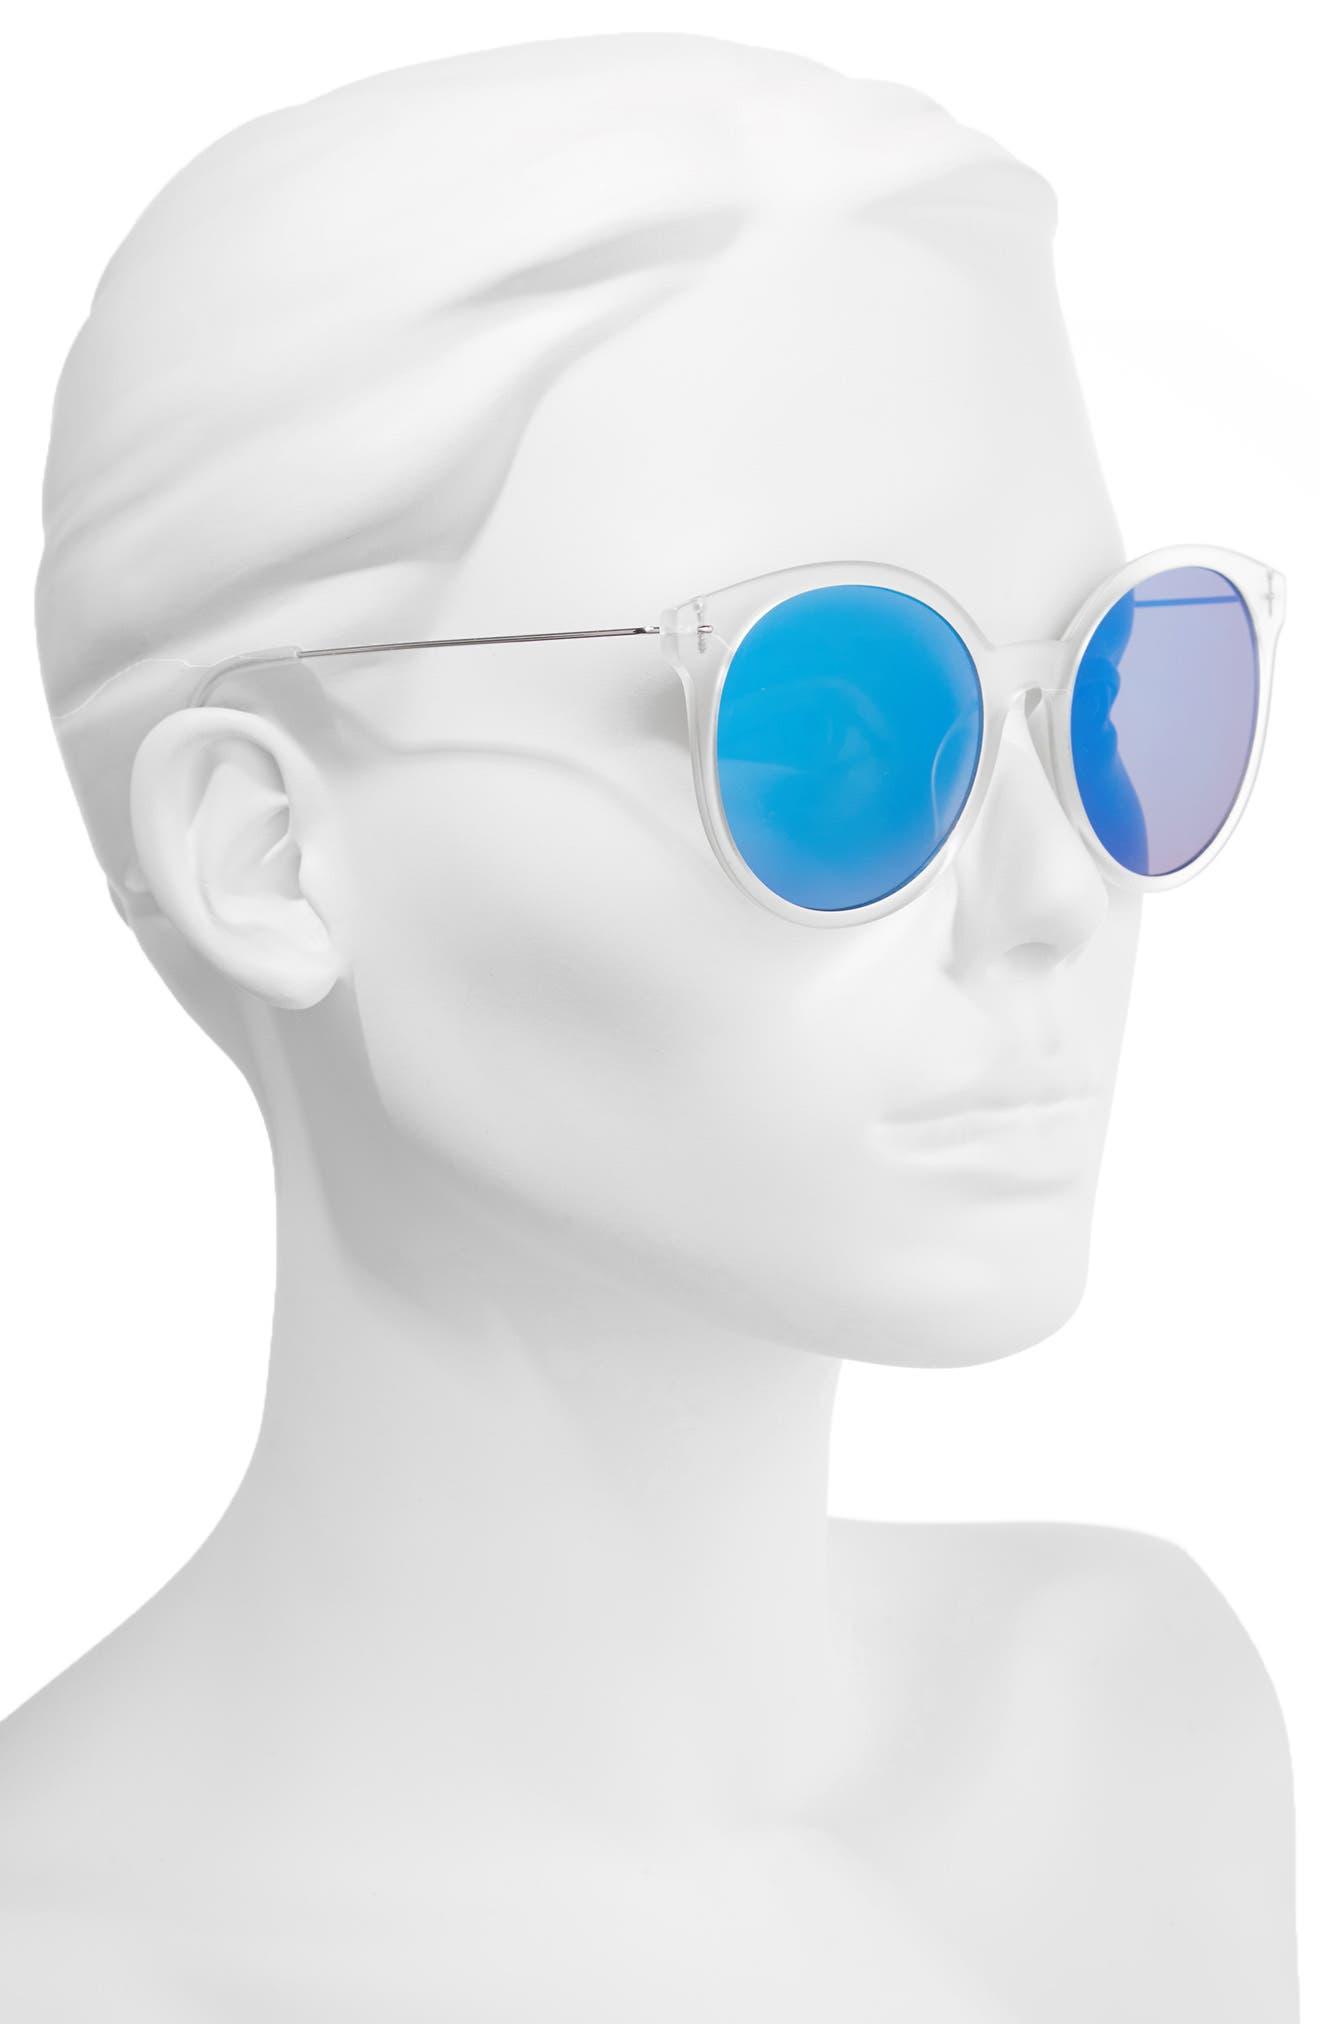 62mm Transparent Round Lens Sunglasses,                             Alternate thumbnail 2, color,                             Clear/ Blue